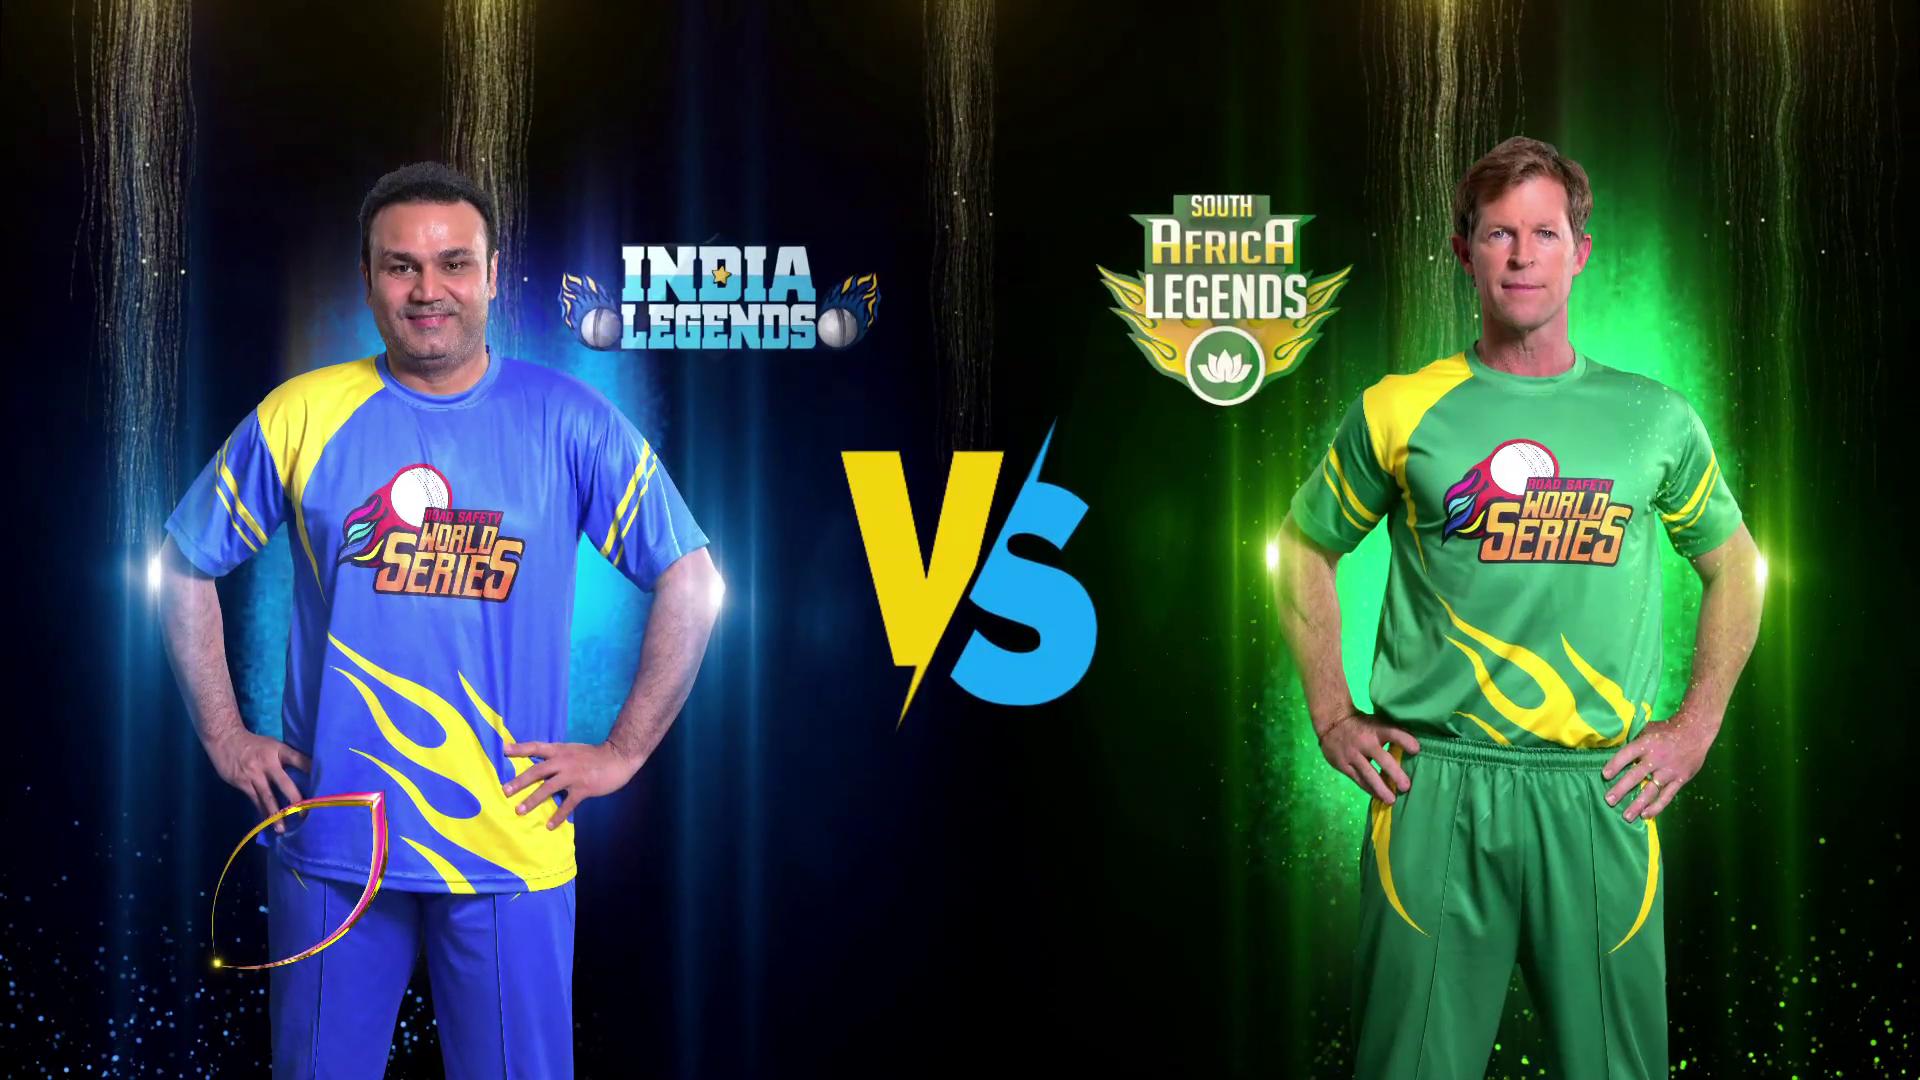 Road Safety World Series 7th March Se Live, Dekhiye Cricket Ki Rivalry Sehwag Vs Jonty Rhodes Ke beech!